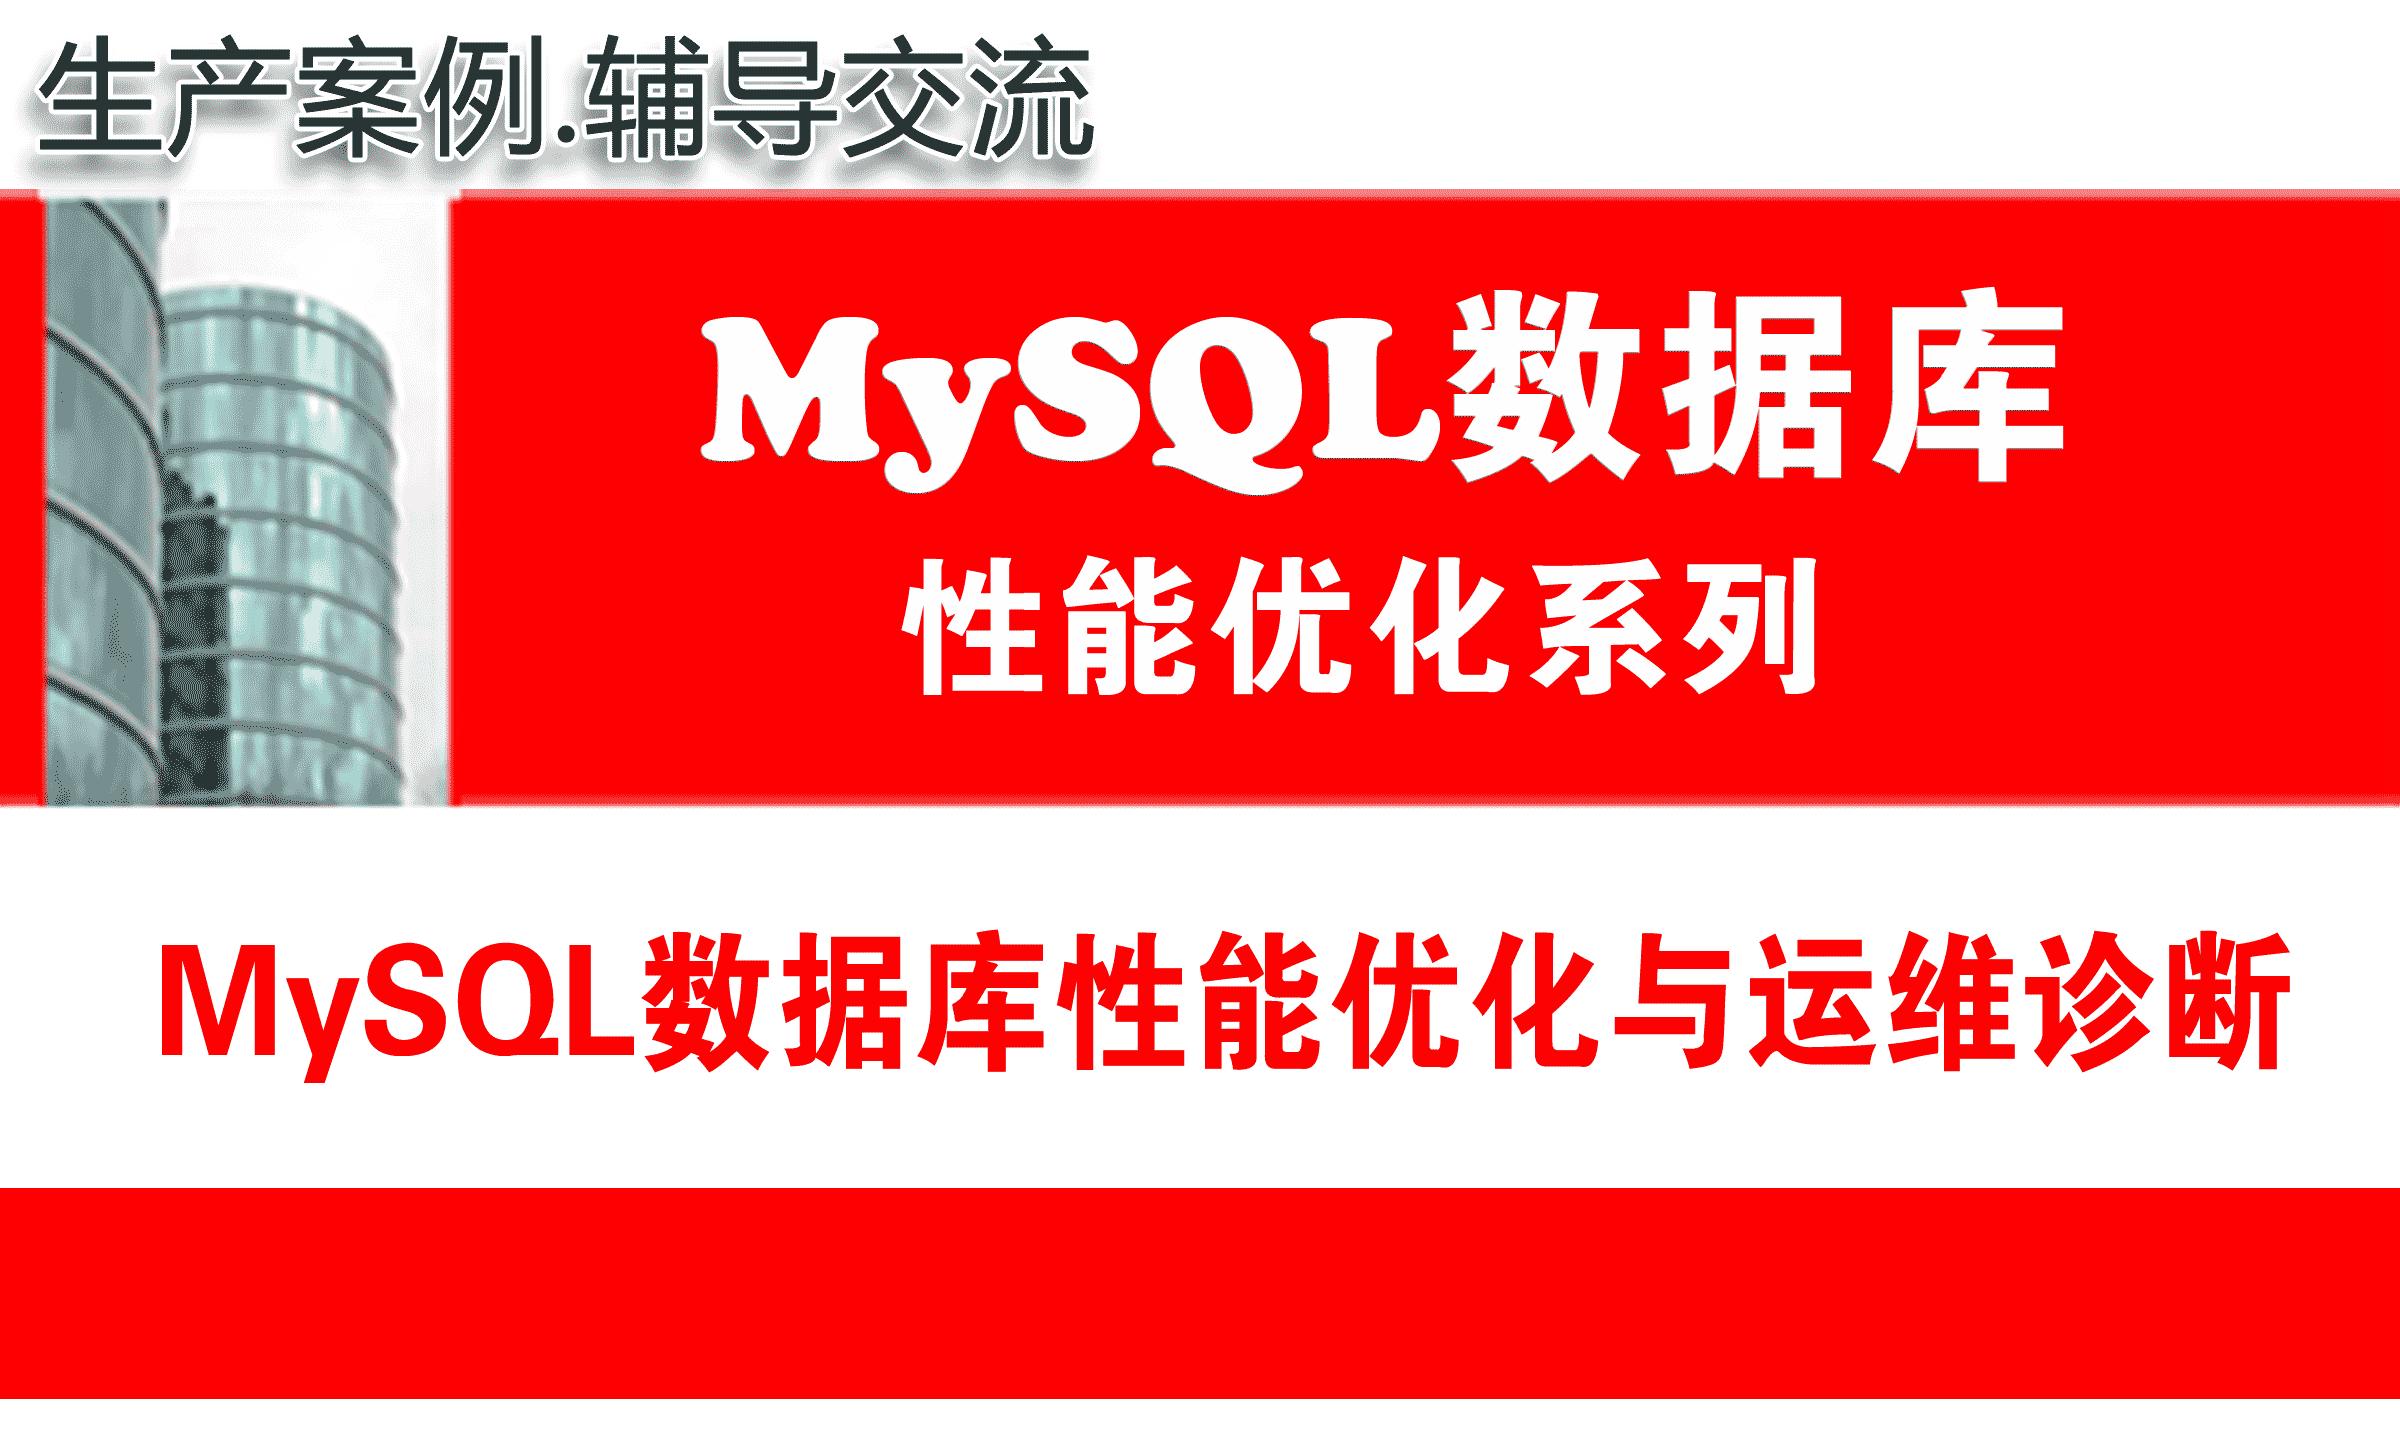 MySQL教程(第七月):MySQL数据库性能大发棋牌大发棋牌技巧技巧 优化 与运维诊断